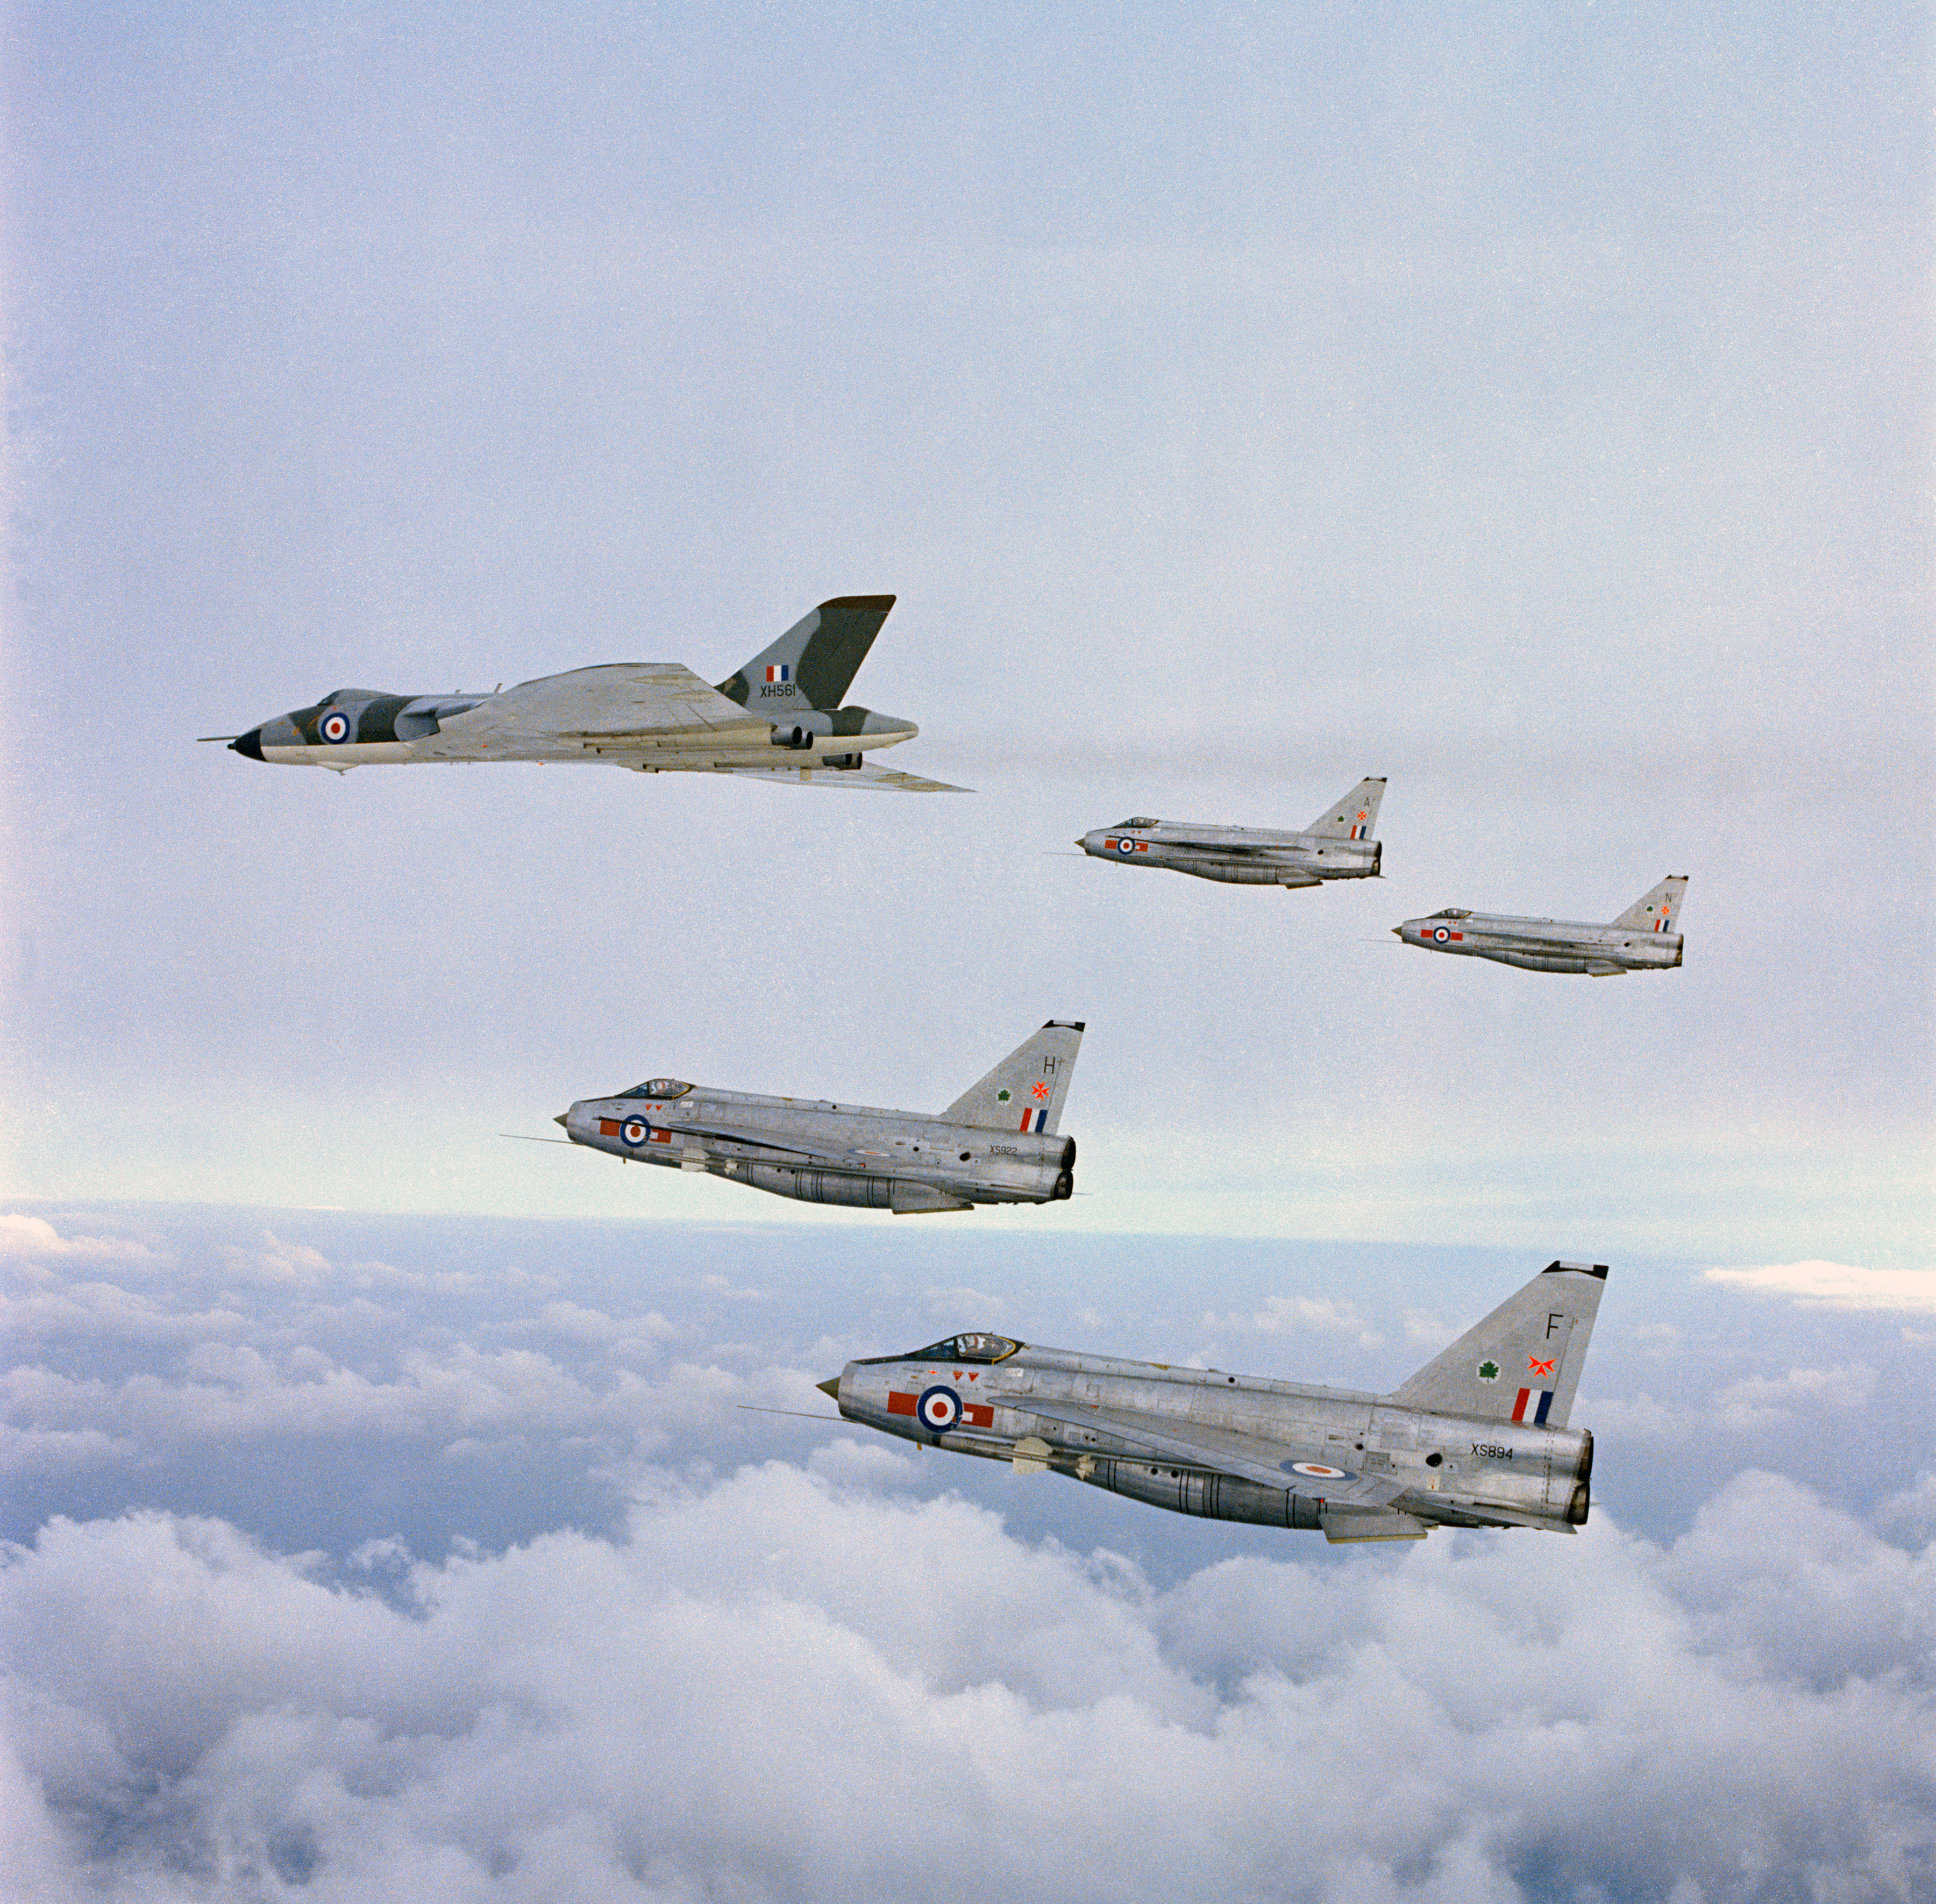 100_years_of_the_RAF_MOD_45163616.jpg